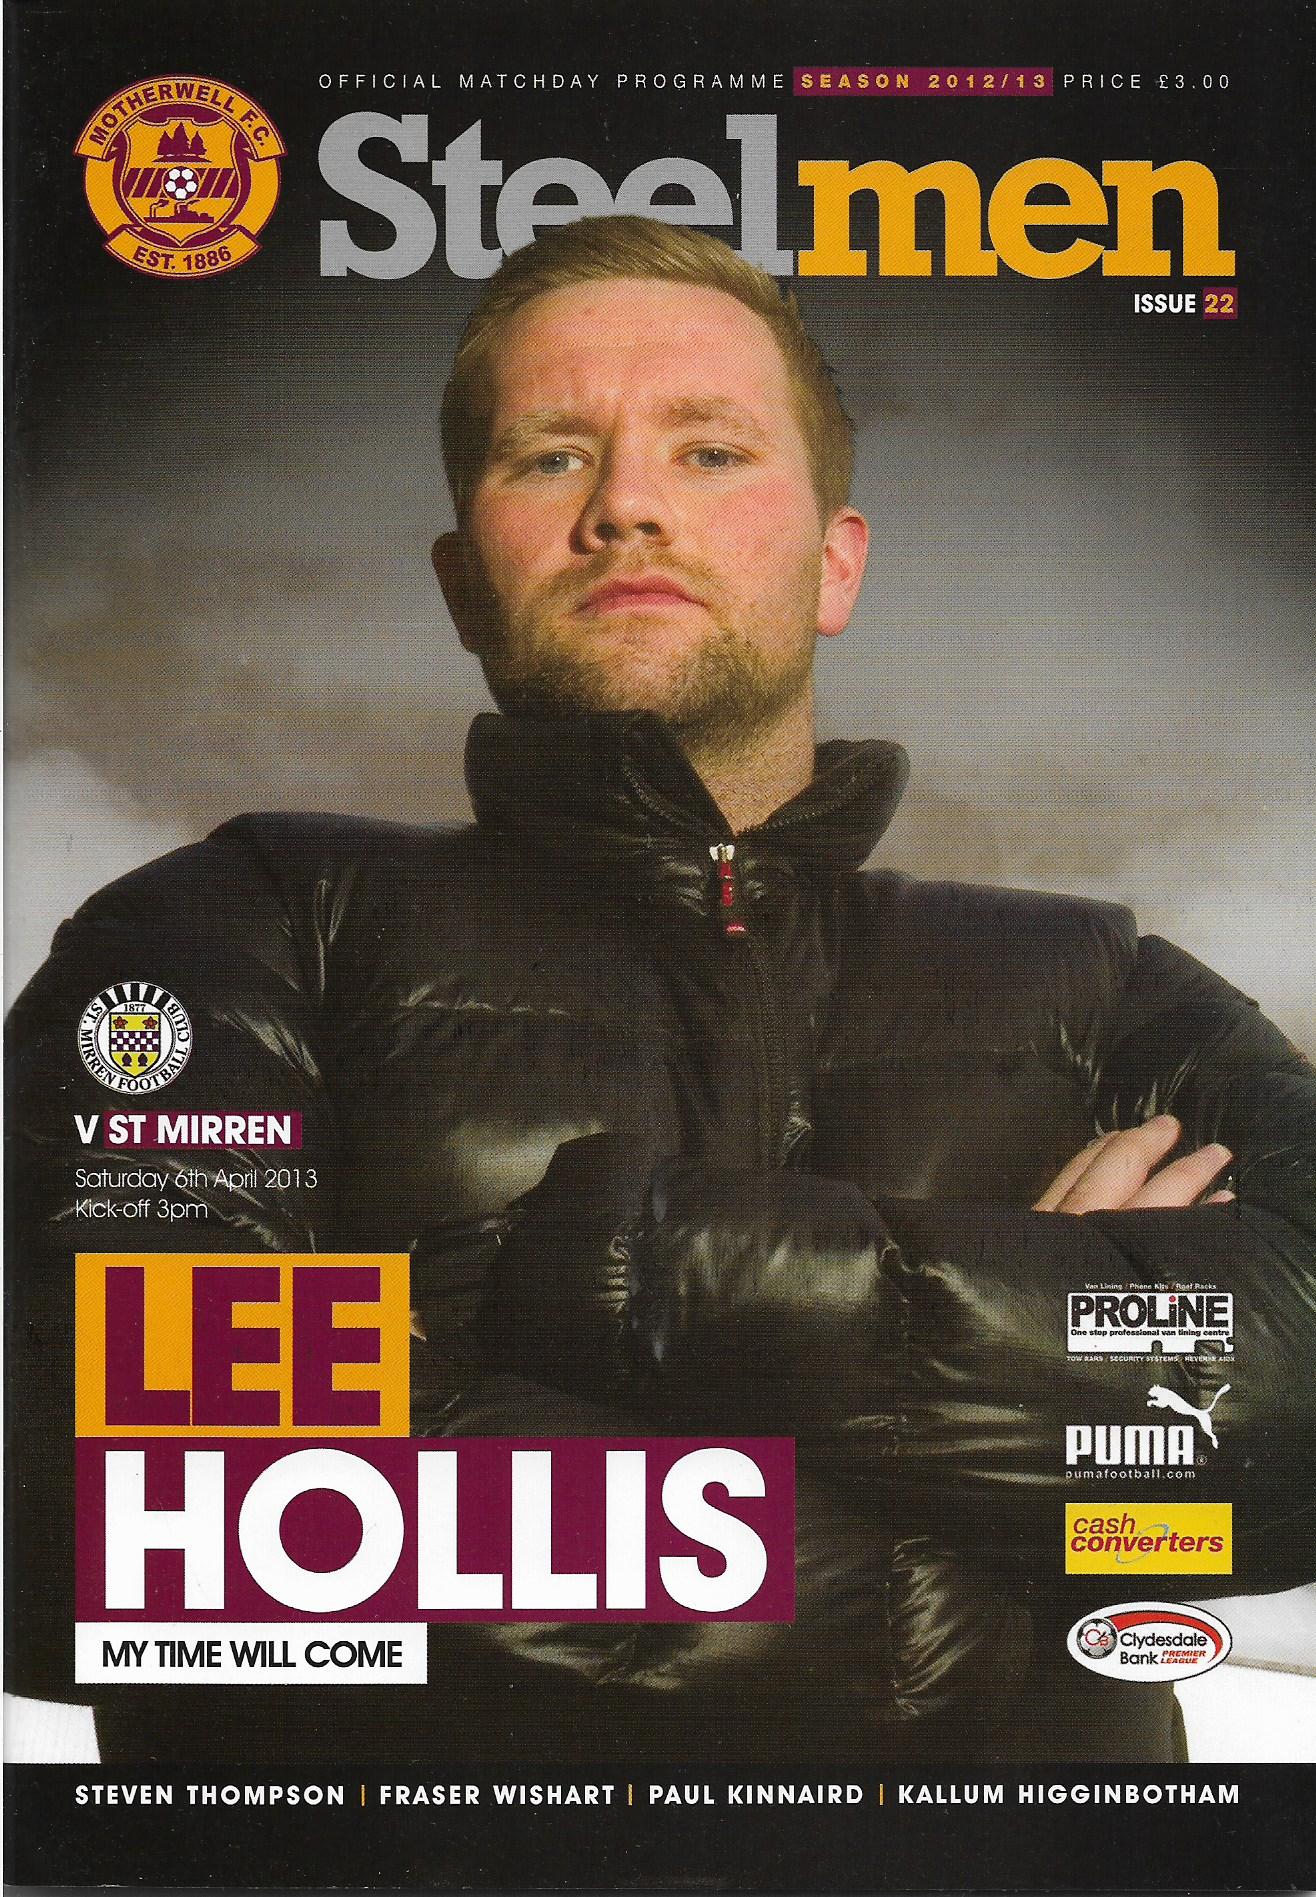 Programme Cover 2012/13 Season